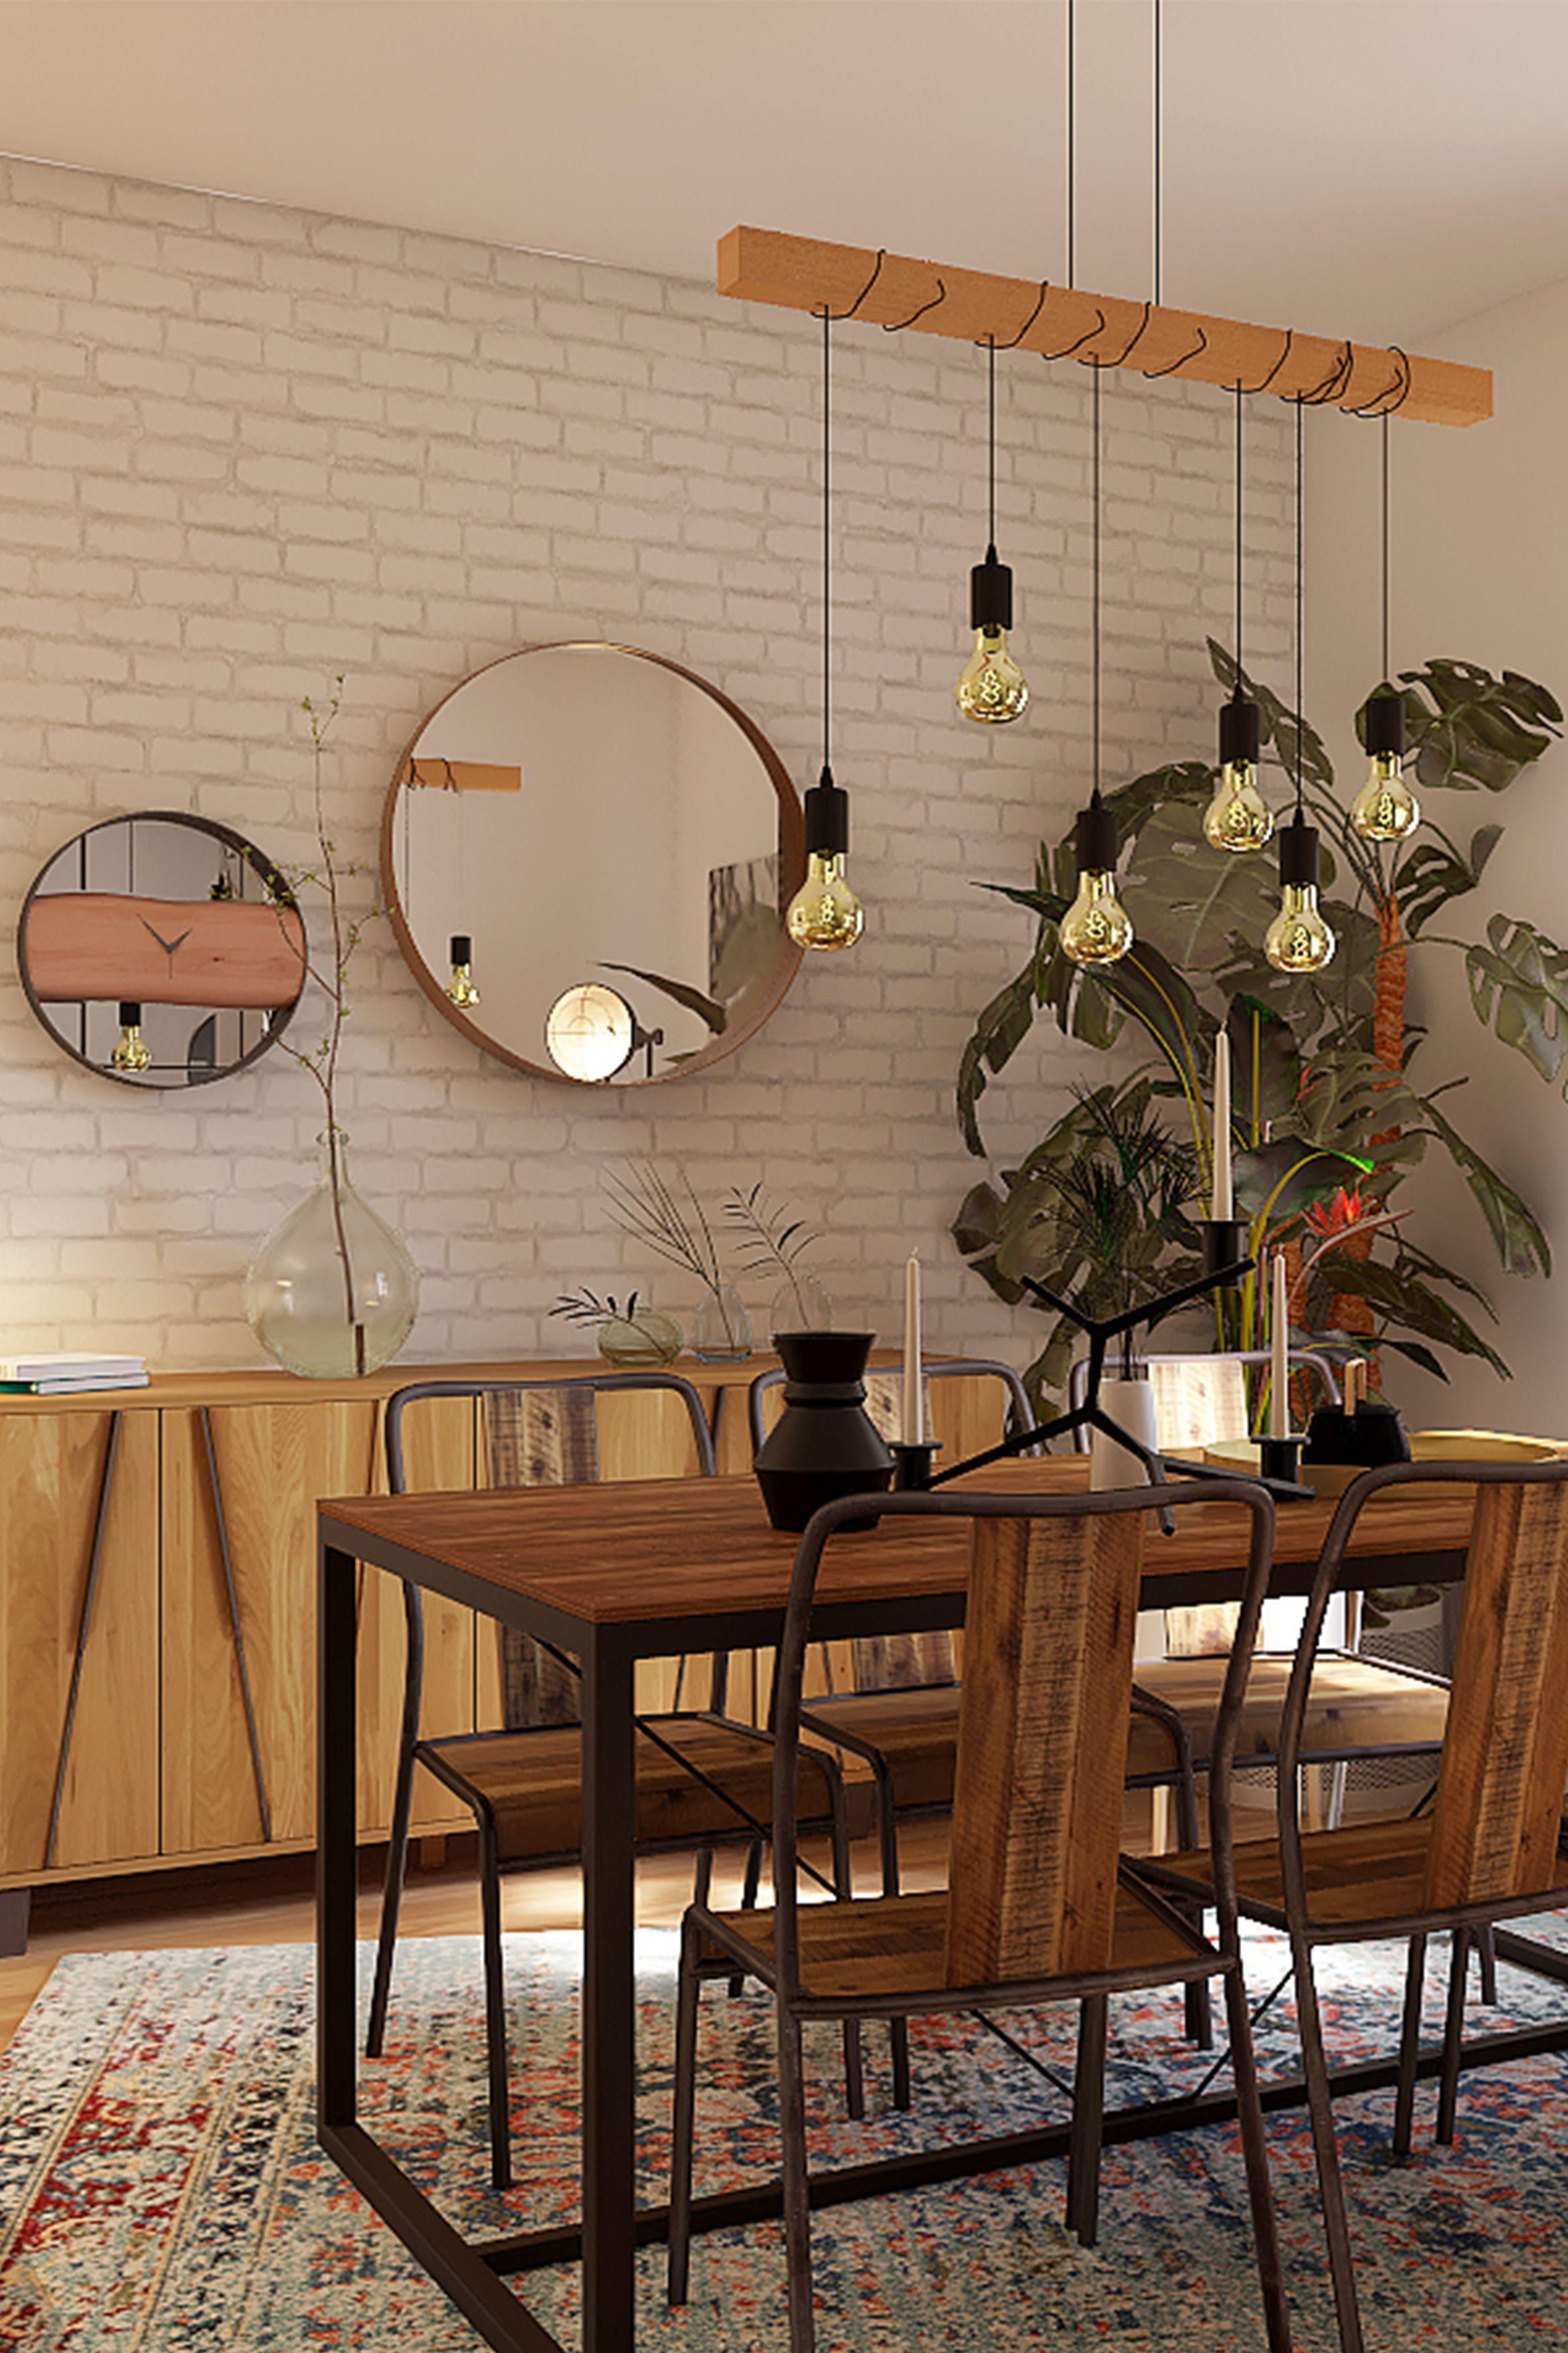 40++ Decoration industrielle salle a manger ideas